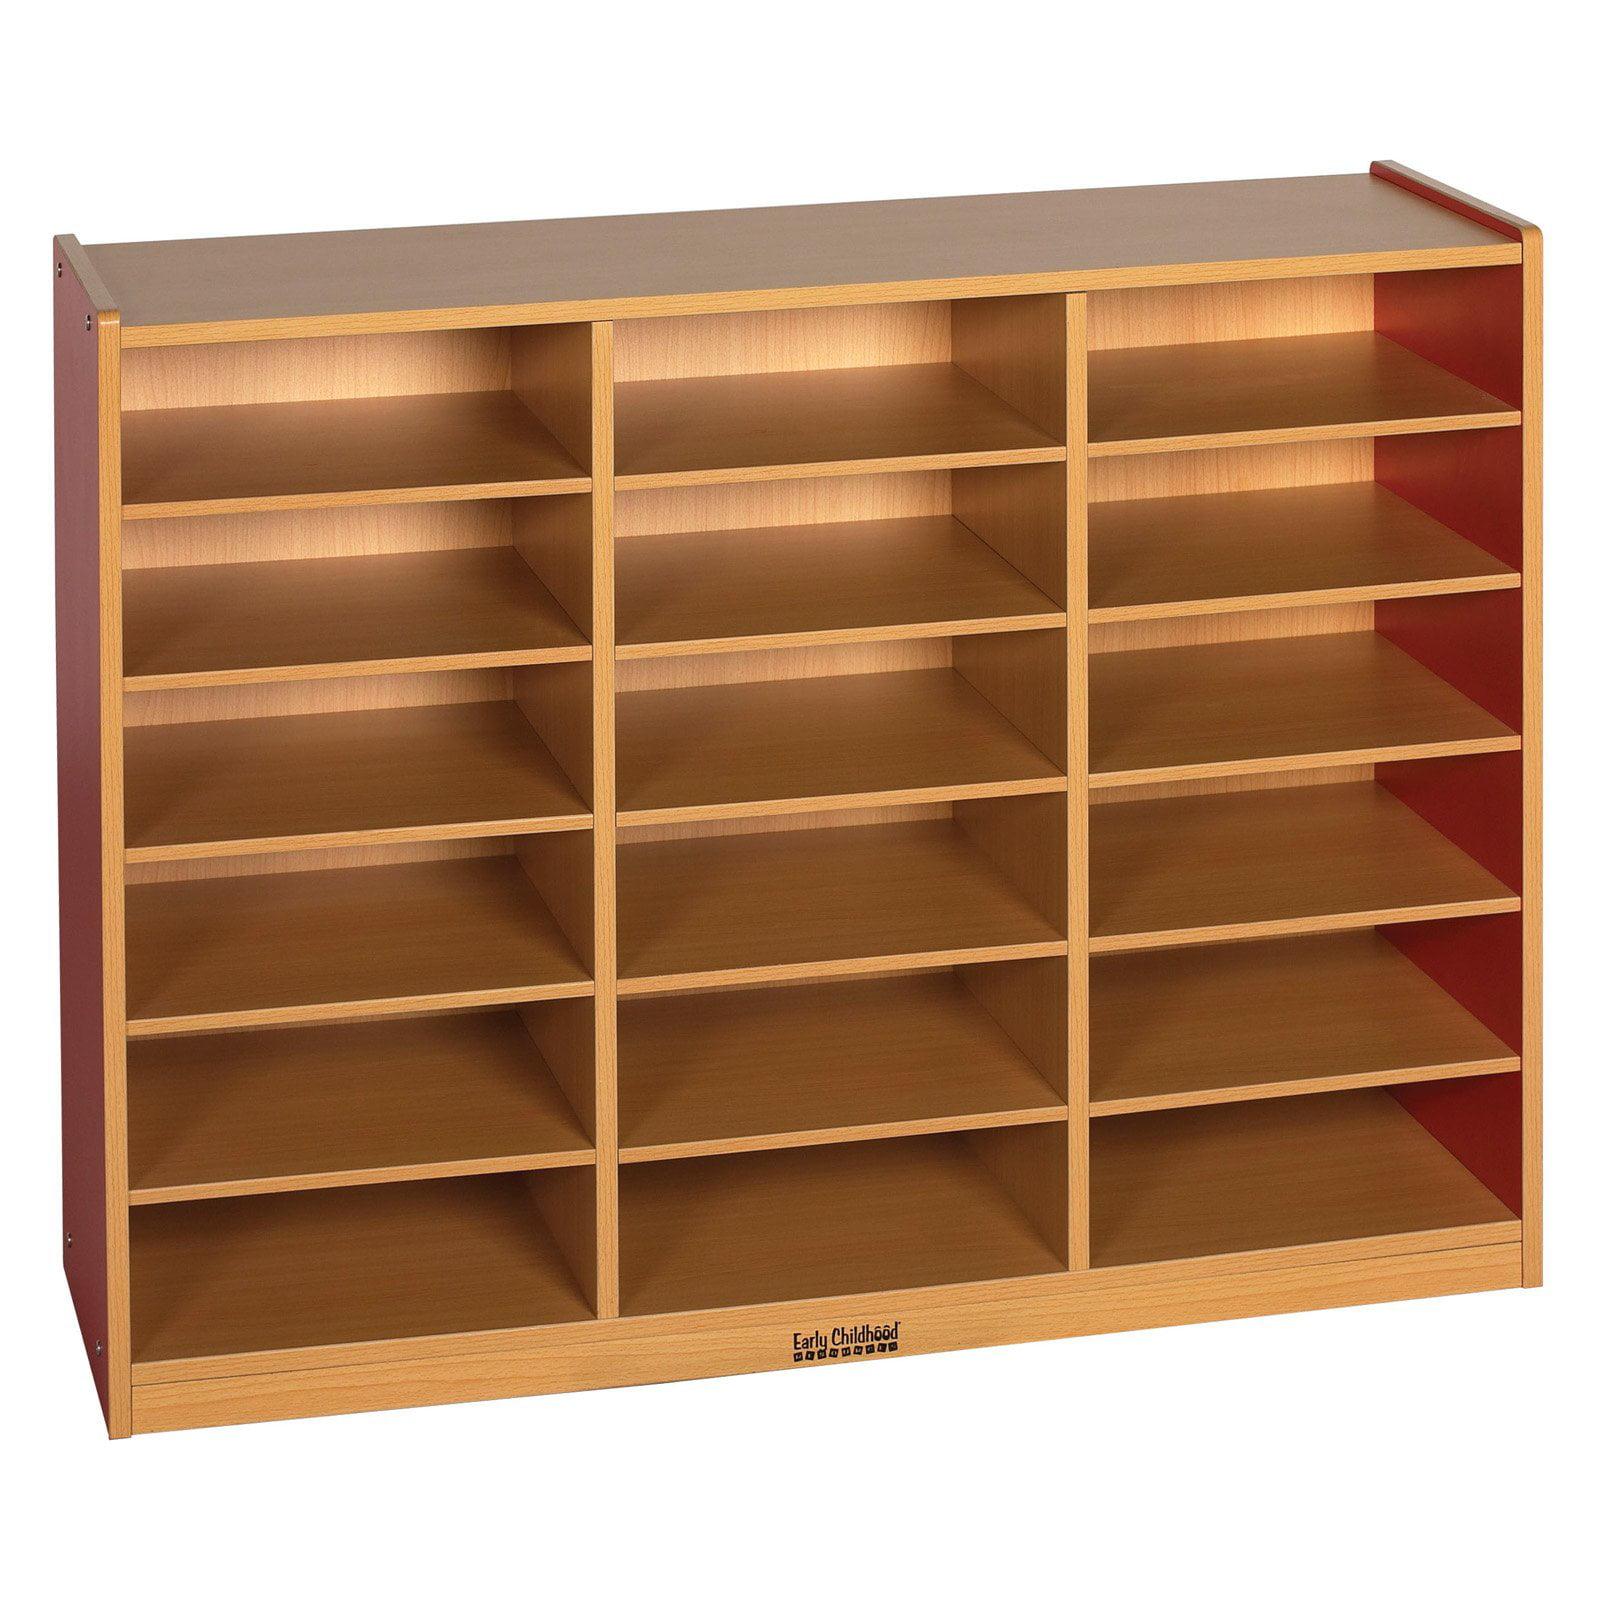 ECR4KIDS 18 Tray Storage Cabinet